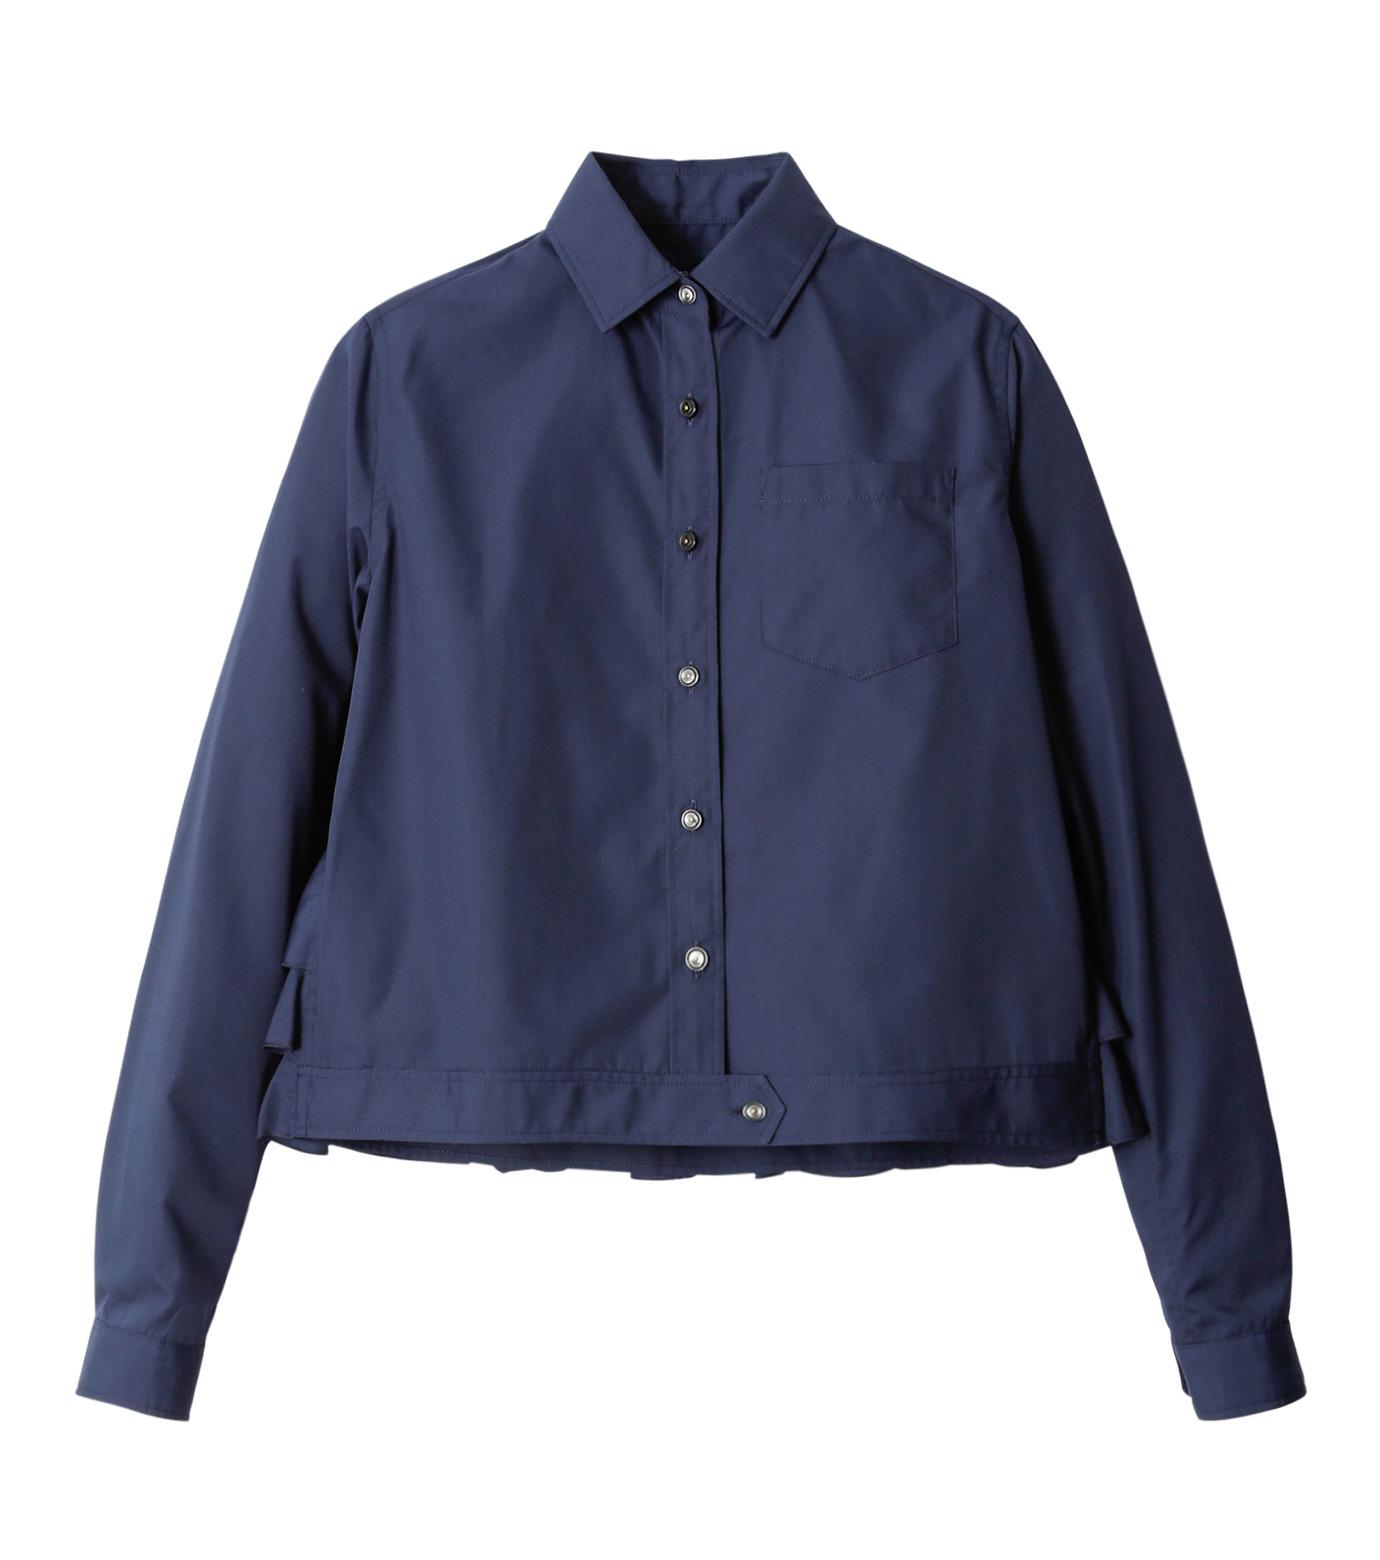 KOLOR(カラー)のShirt w/Back Ruffle Detail-NAVY(シャツ/shirt)-16WCL-B02134-93 拡大詳細画像5